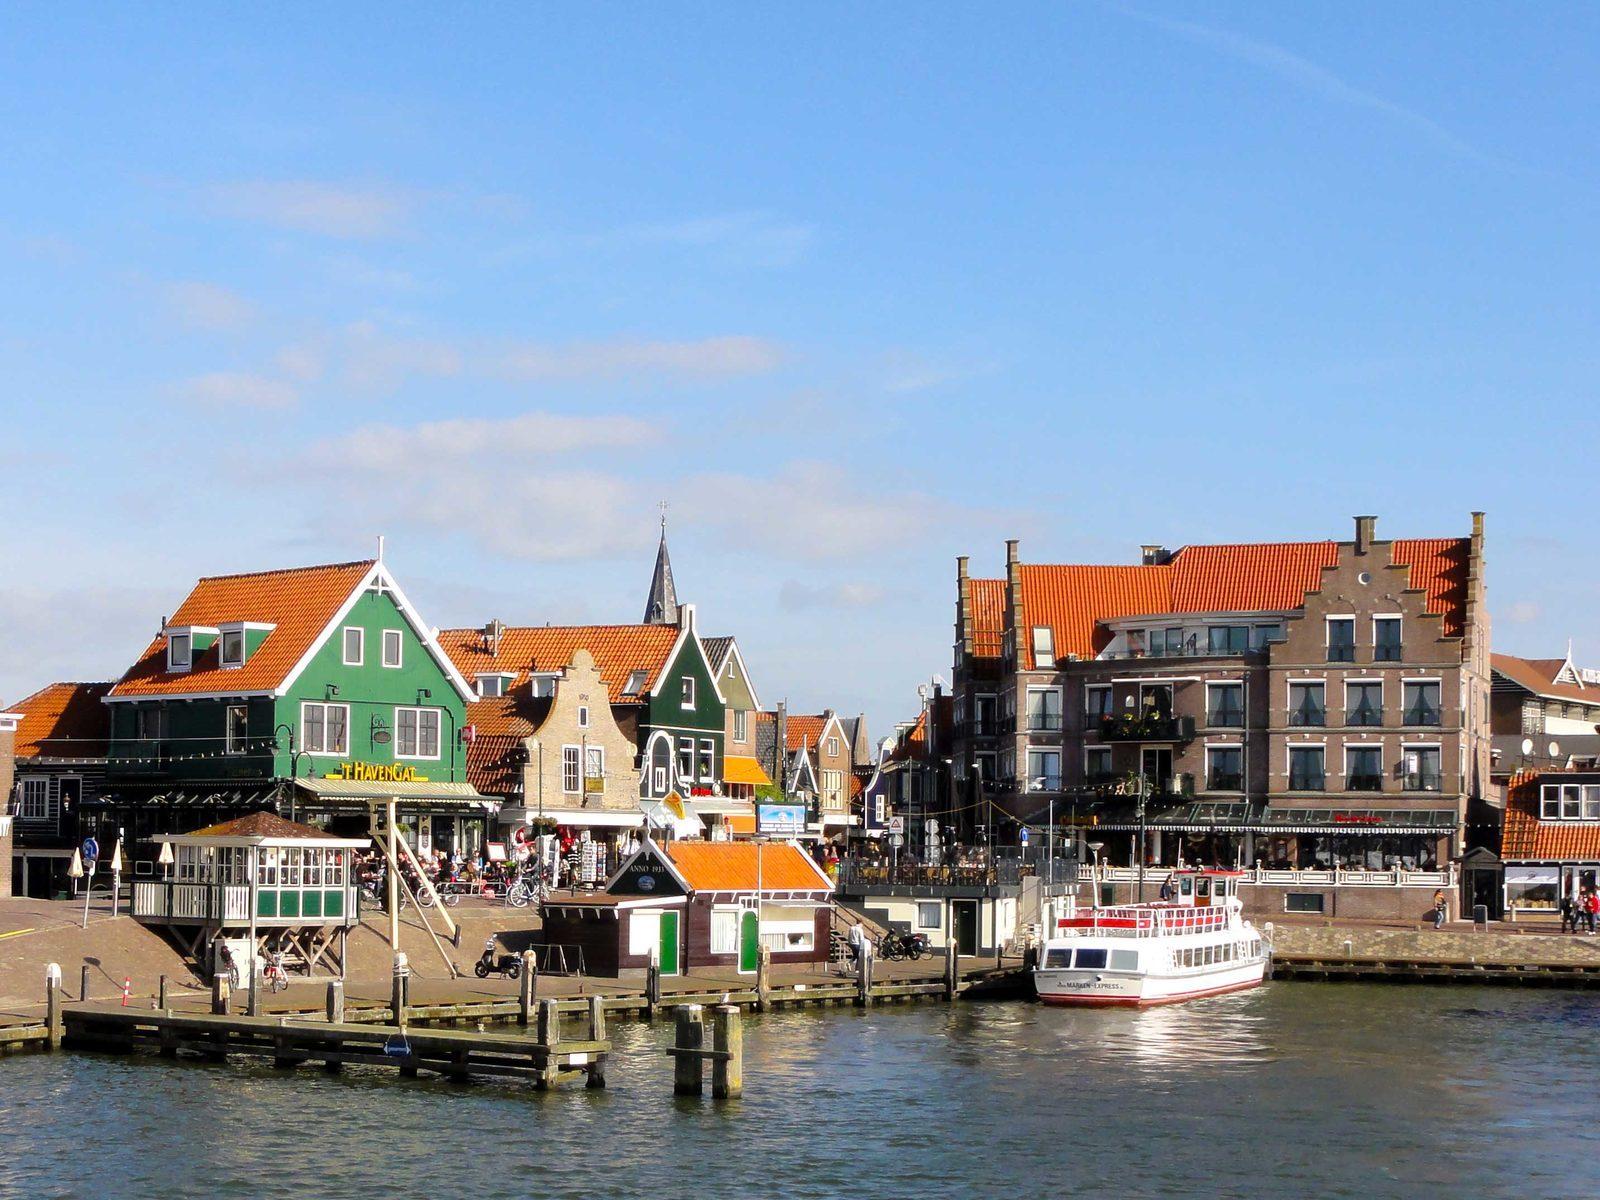 Holiday park Volendam